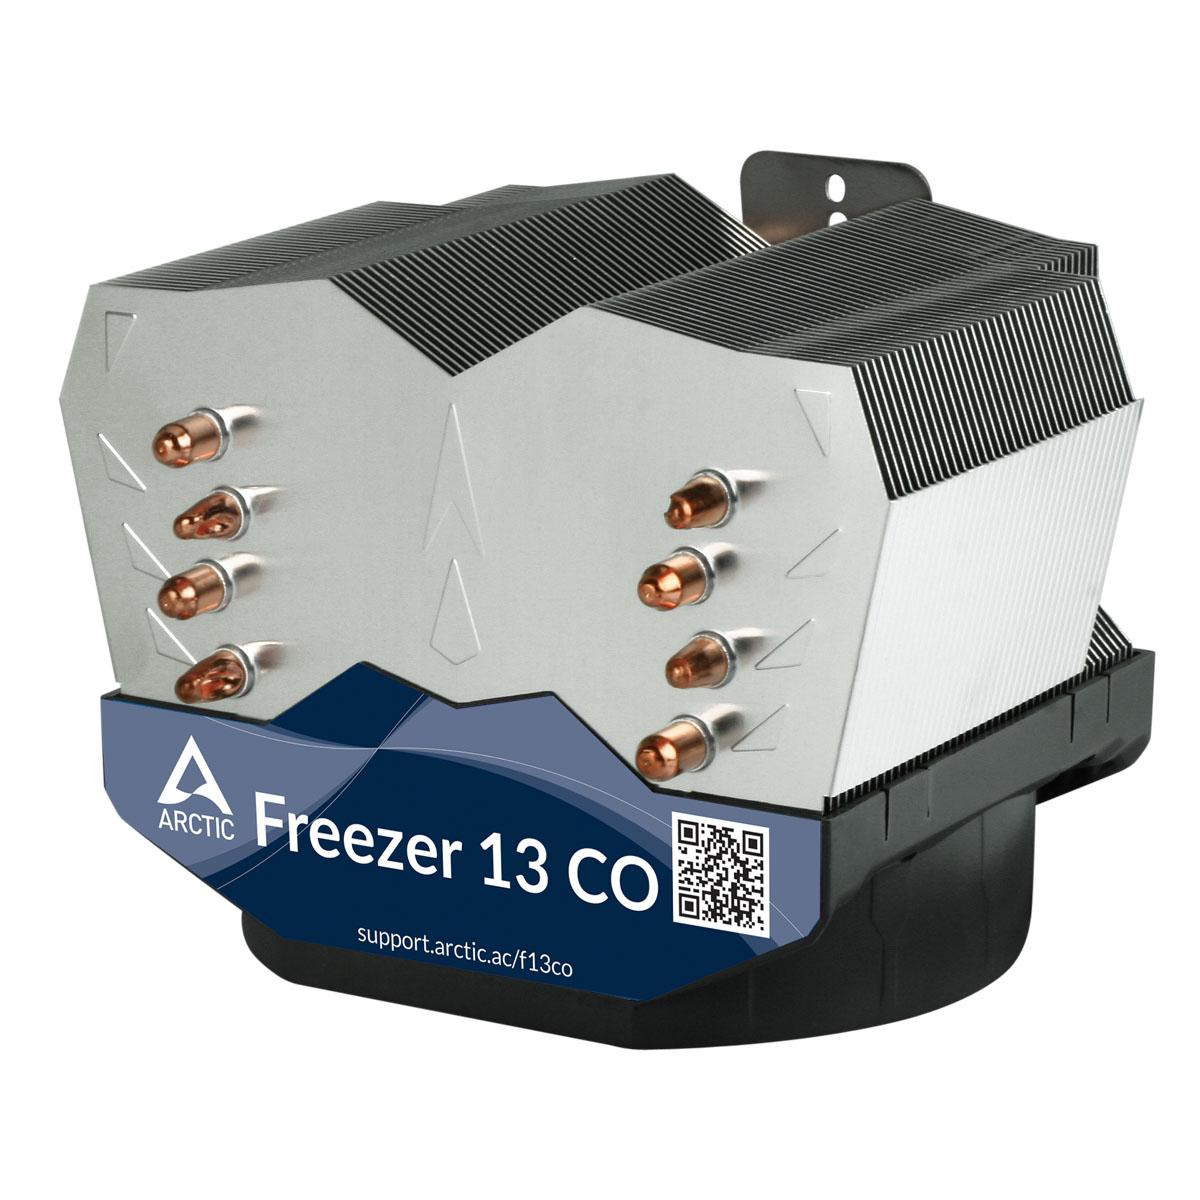 Freezer 13 CO